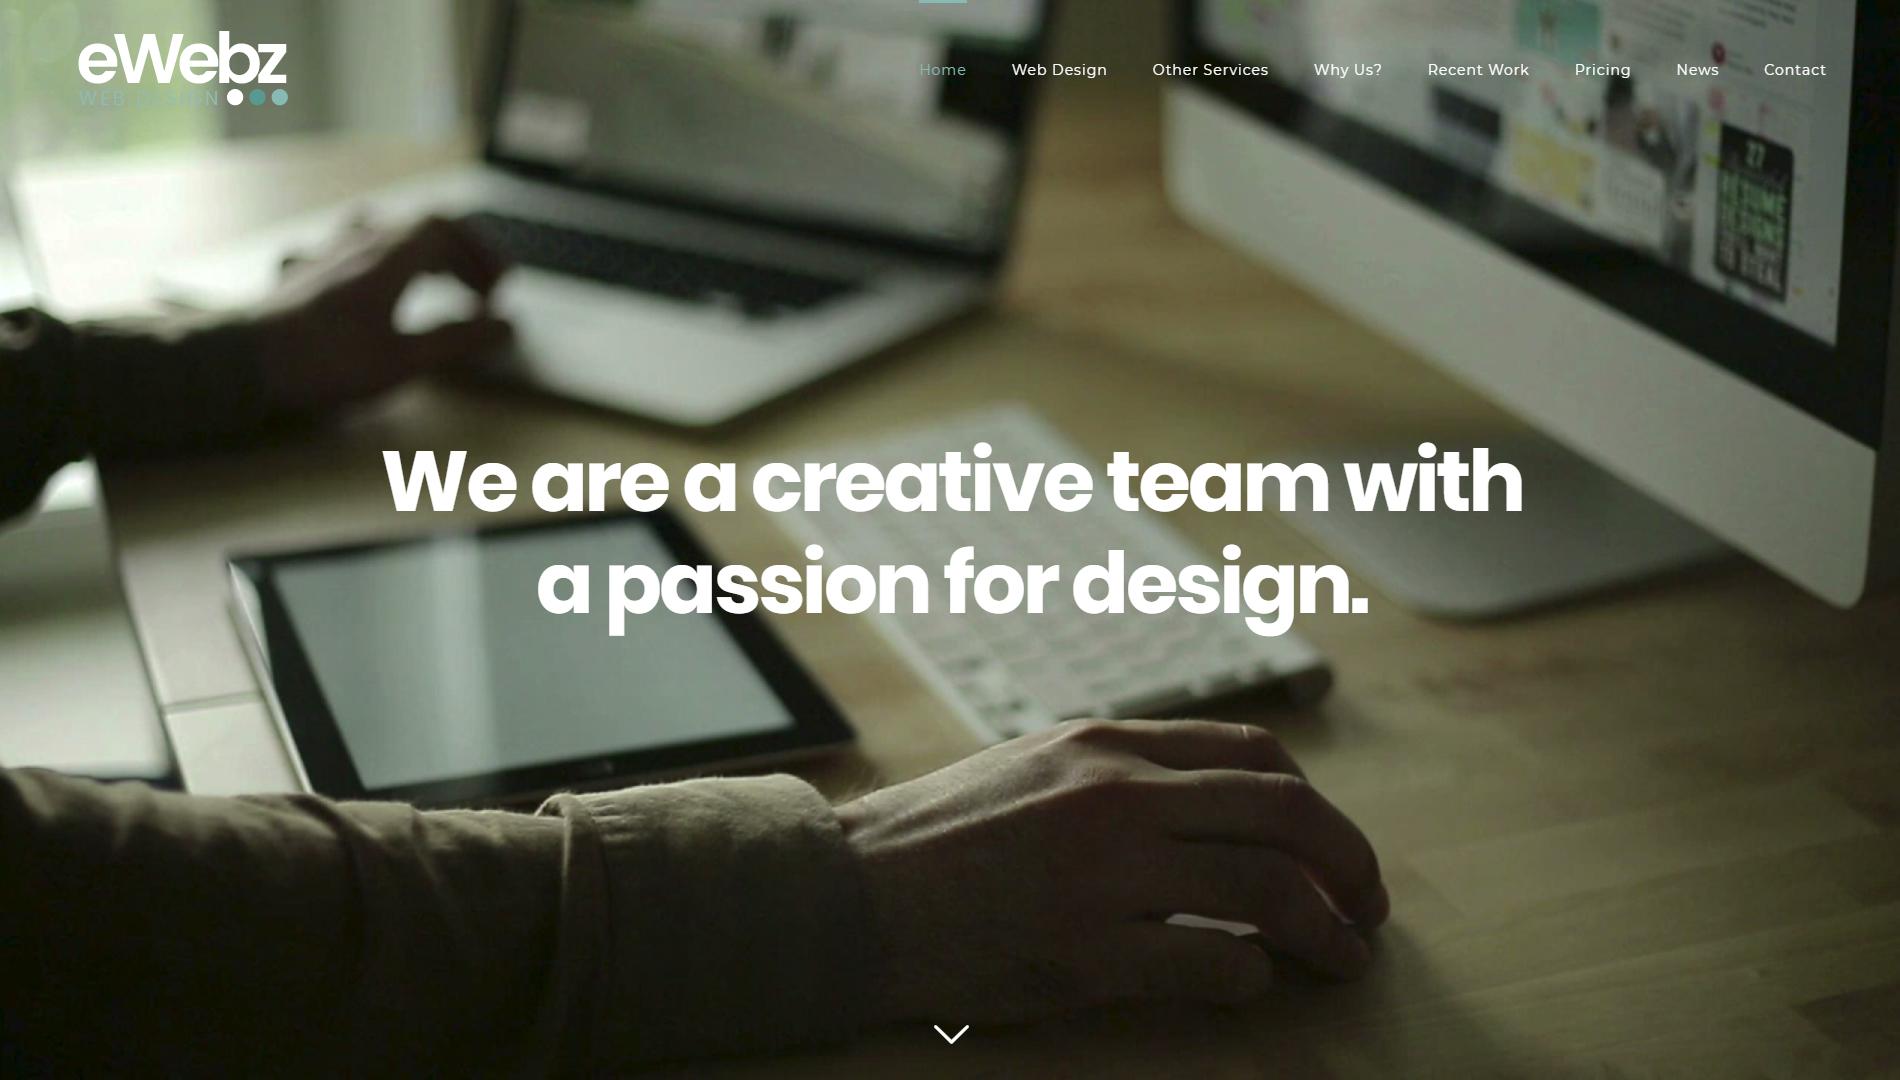 eWebz Web Design & SEO - Tamworth, Staffordshire B77 2QQ - 07523 103295 | ShowMeLocal.com